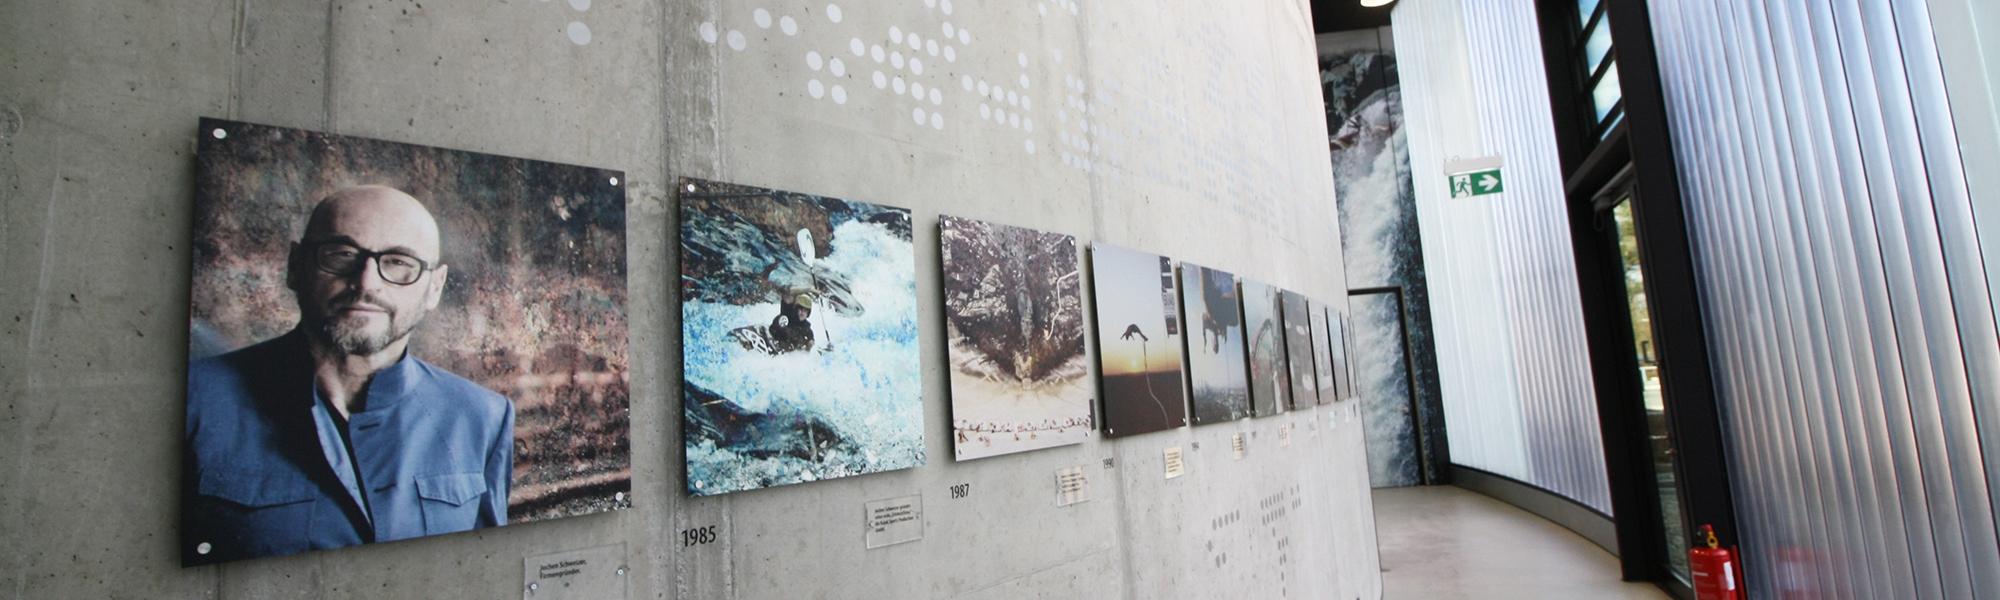 Leinwand Wandbilder Brandeo Gmbh